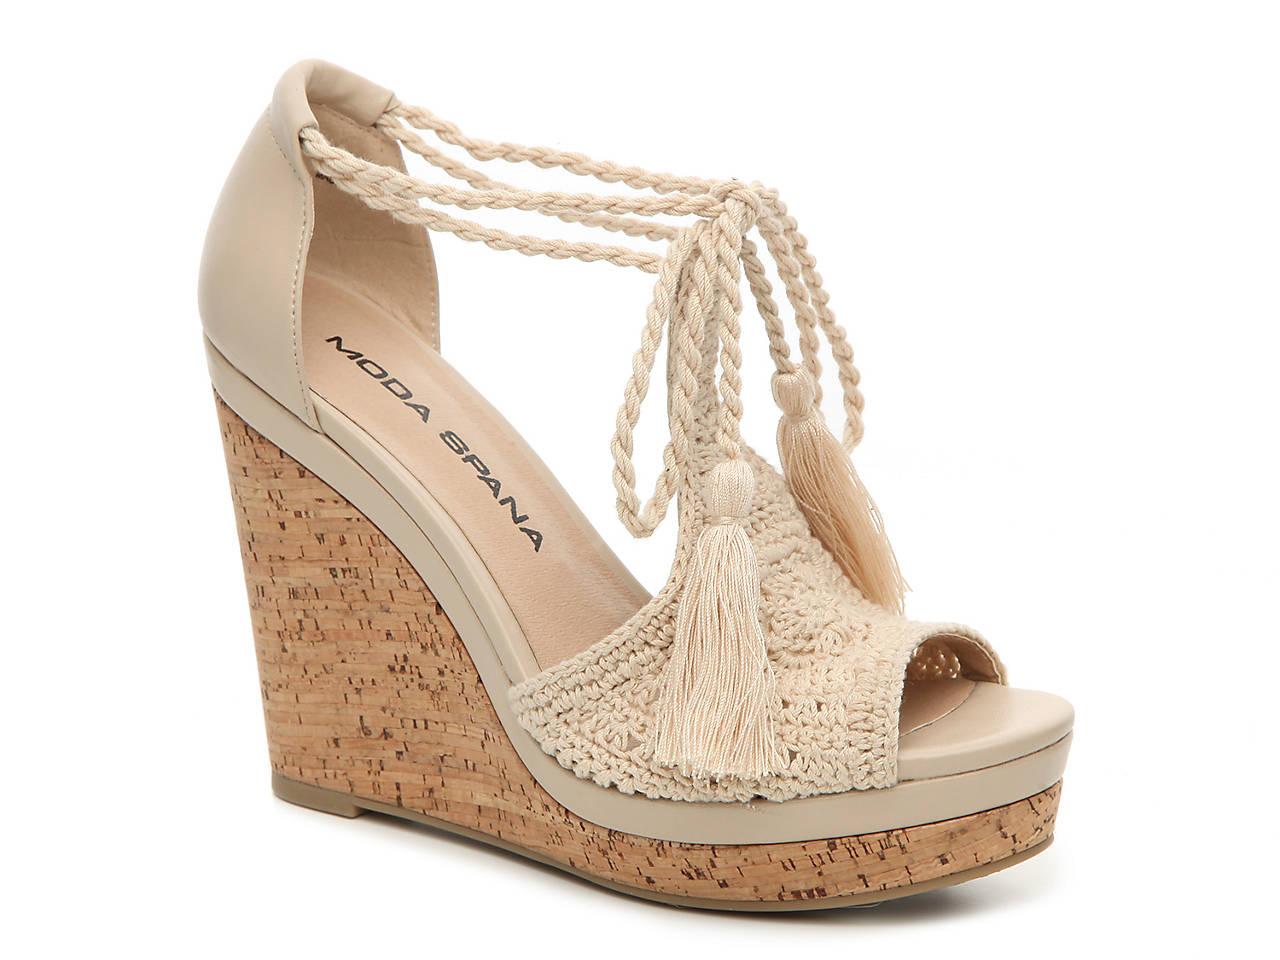 6bfa5e975f13 Moda Spana Wanda Wedge Sandal Women s Shoes